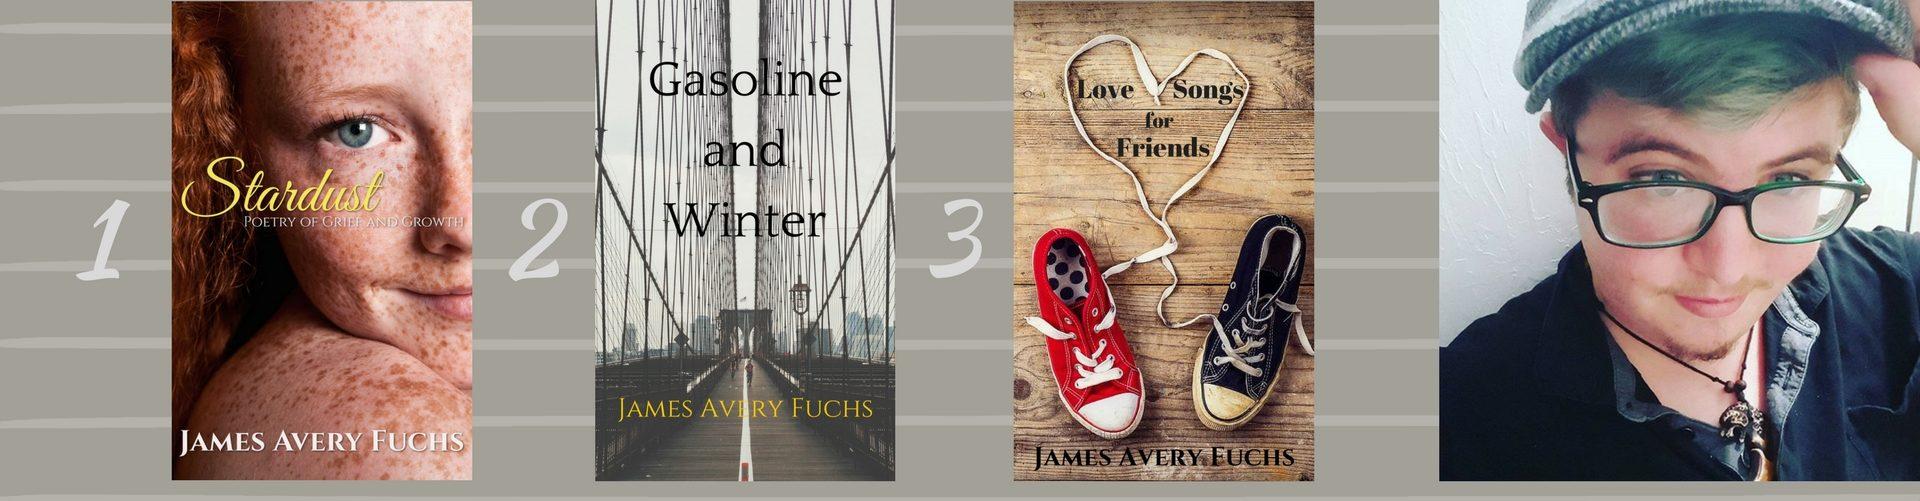 James Avery Fuchs